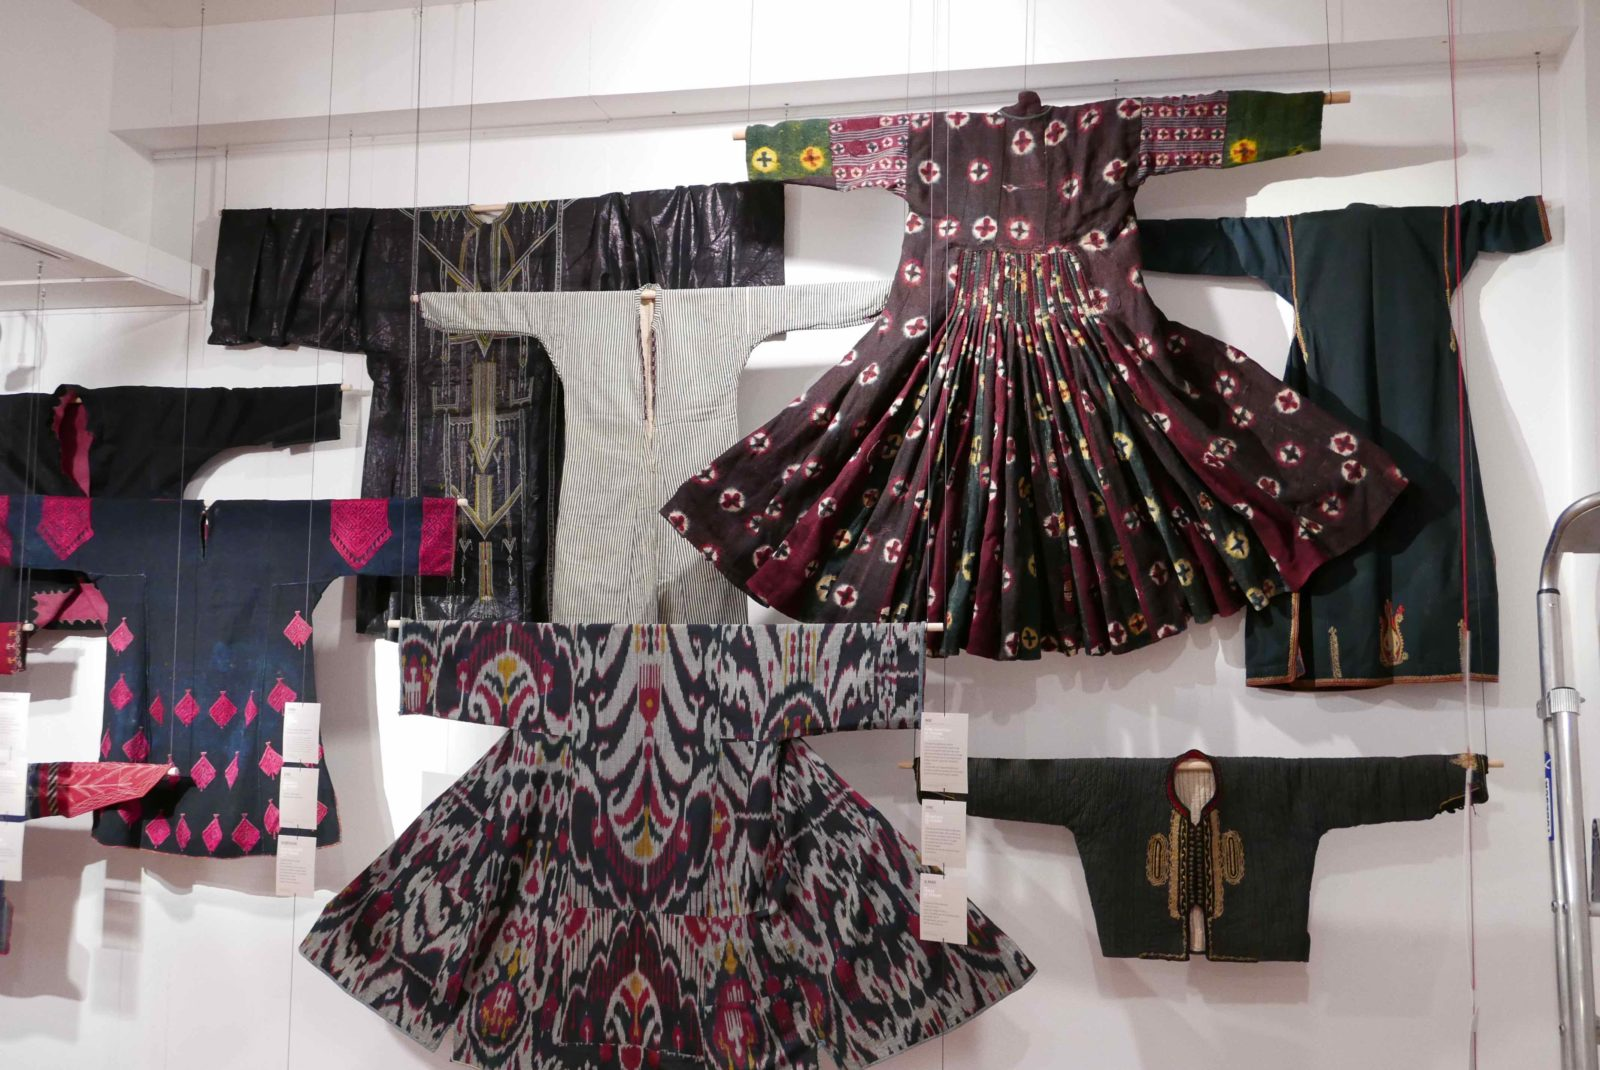 Musée de Bourgoin-Jallieu - Indigo robes vestes